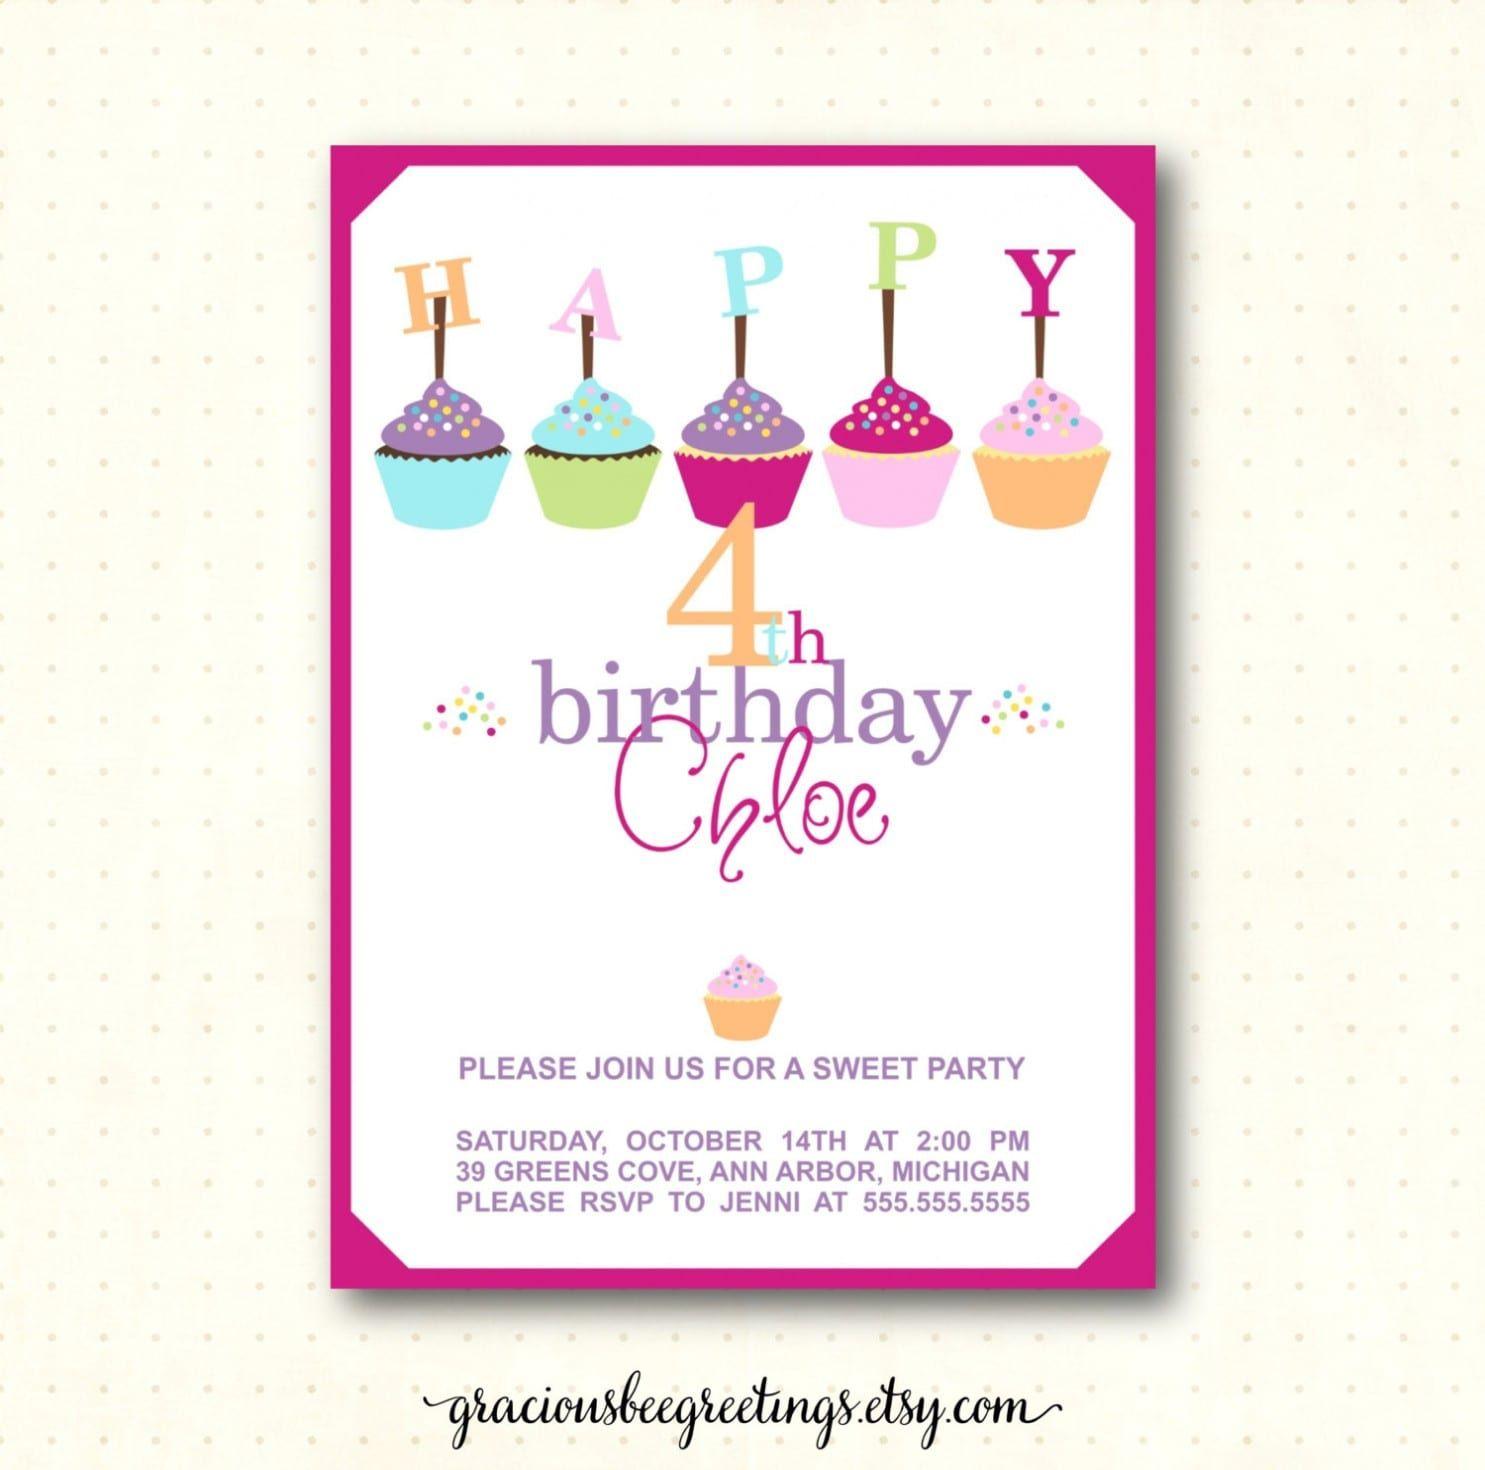 9th Birthday Party Invitation Wording